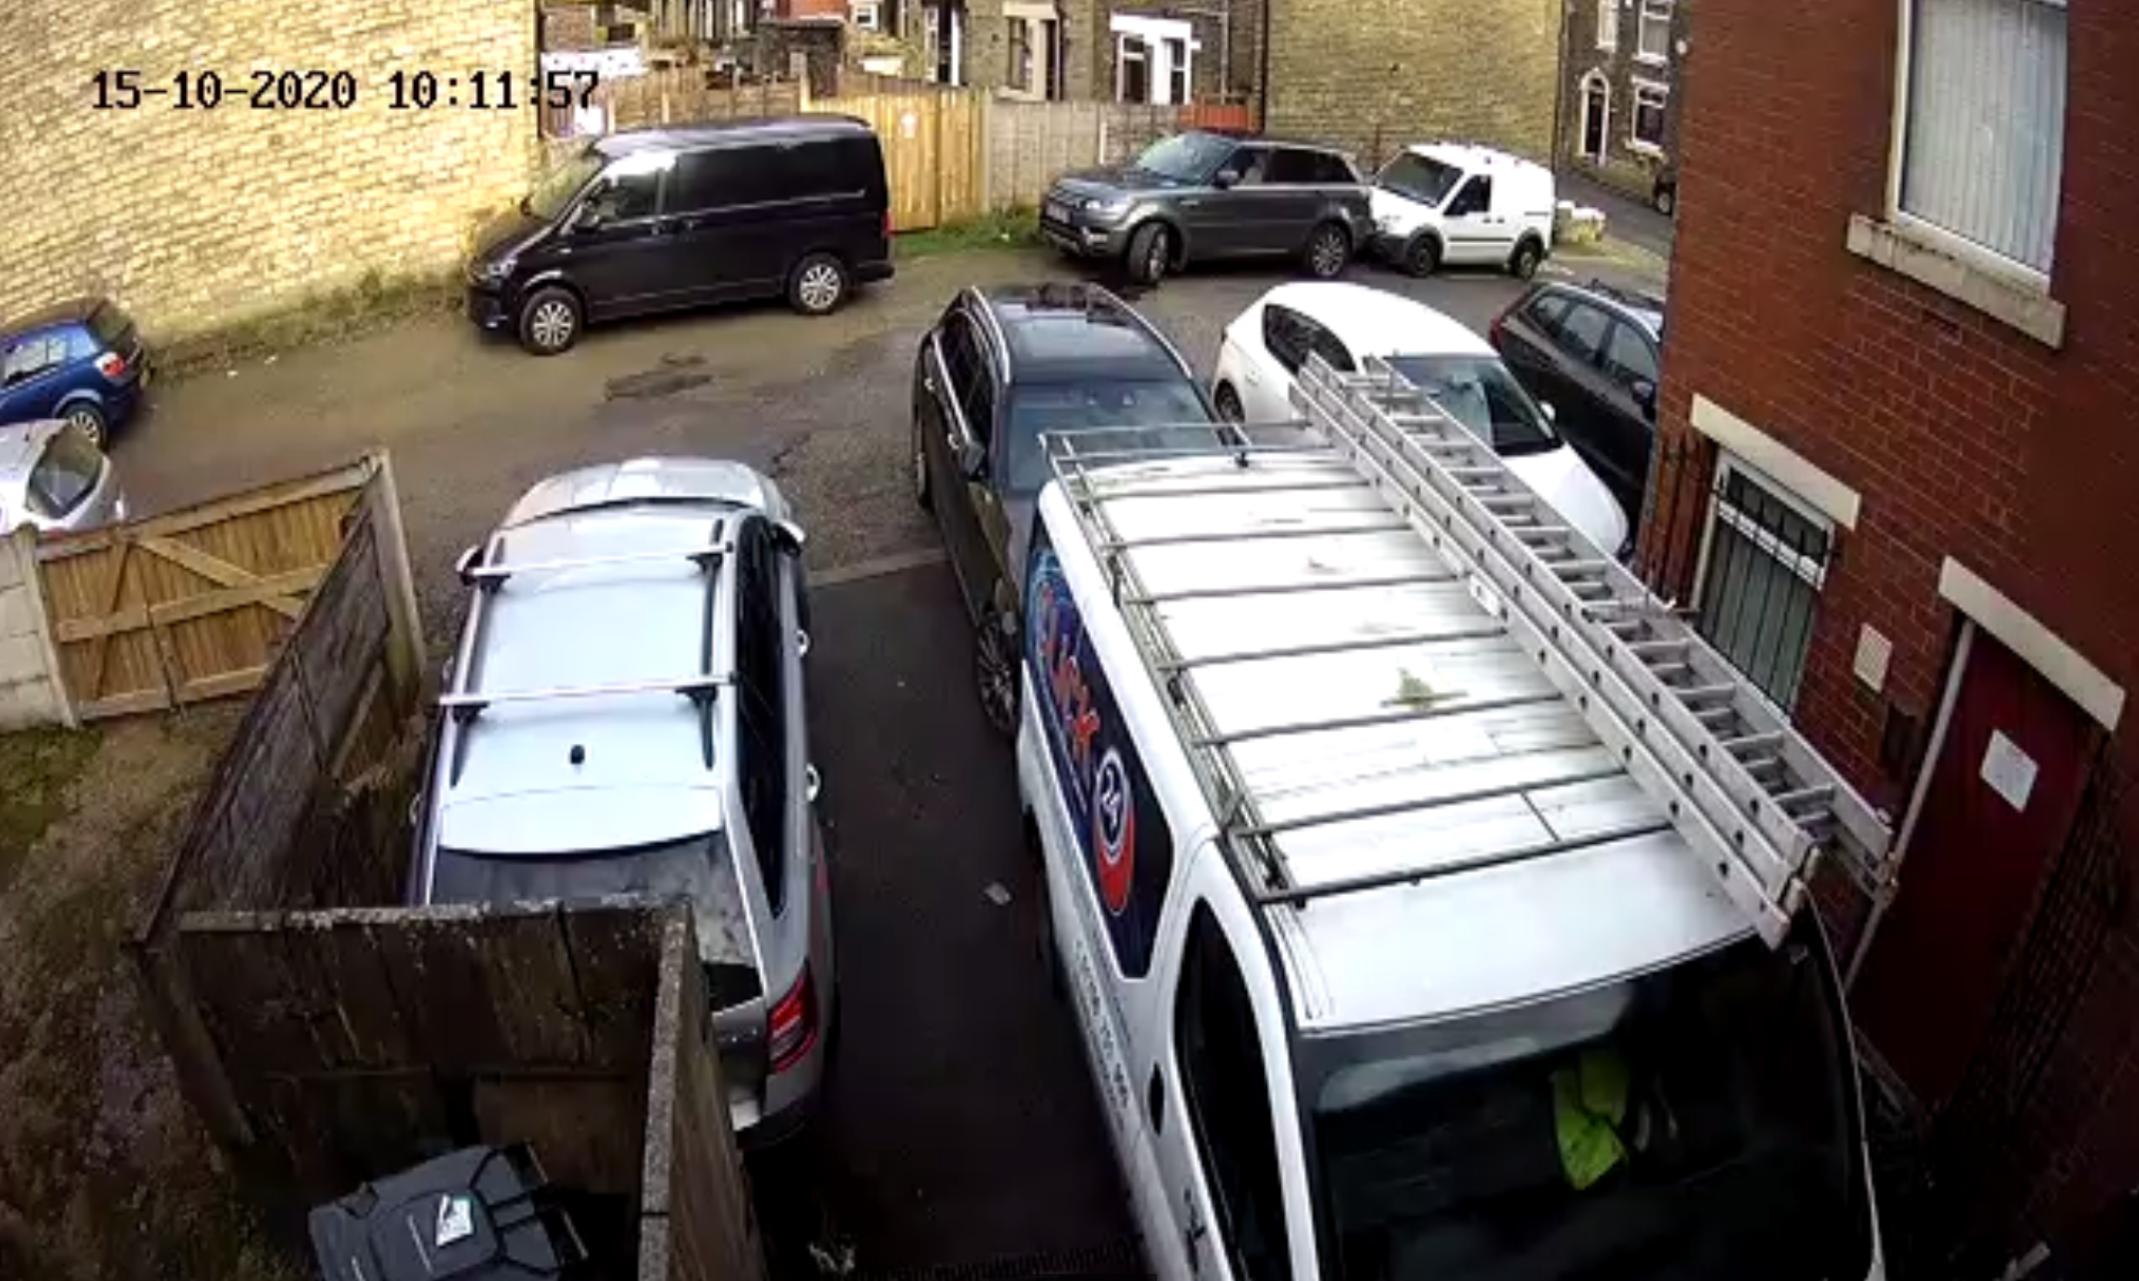 CCTV footage at Click 24